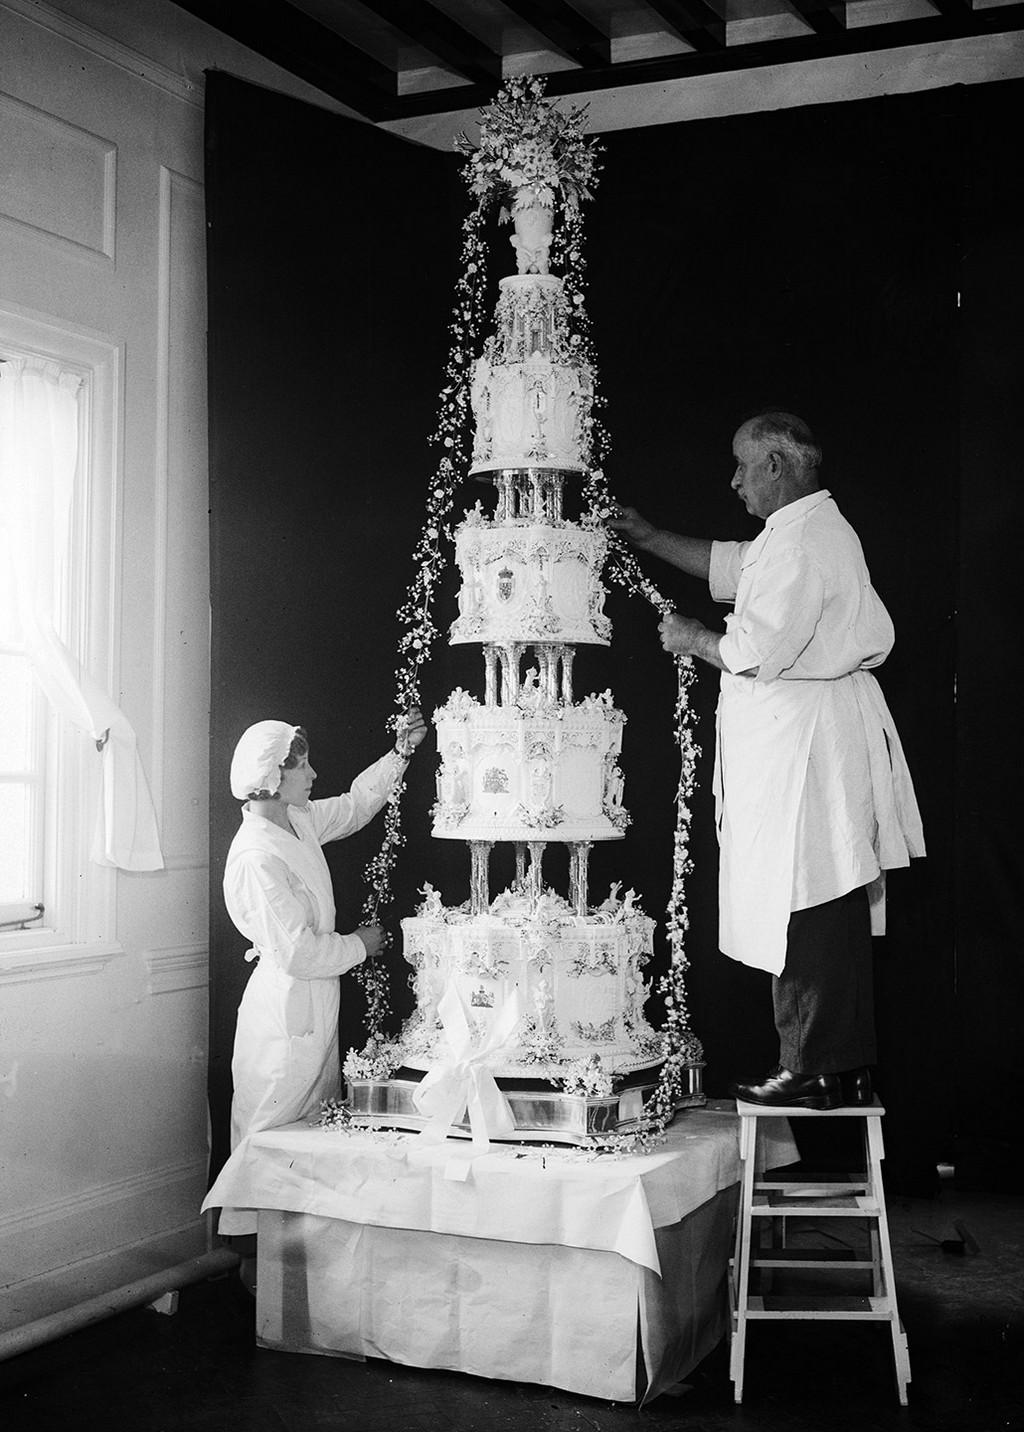 55aff35e9e9755183d976ea4_tiers-of-joy-royal-wedding-cakes-07